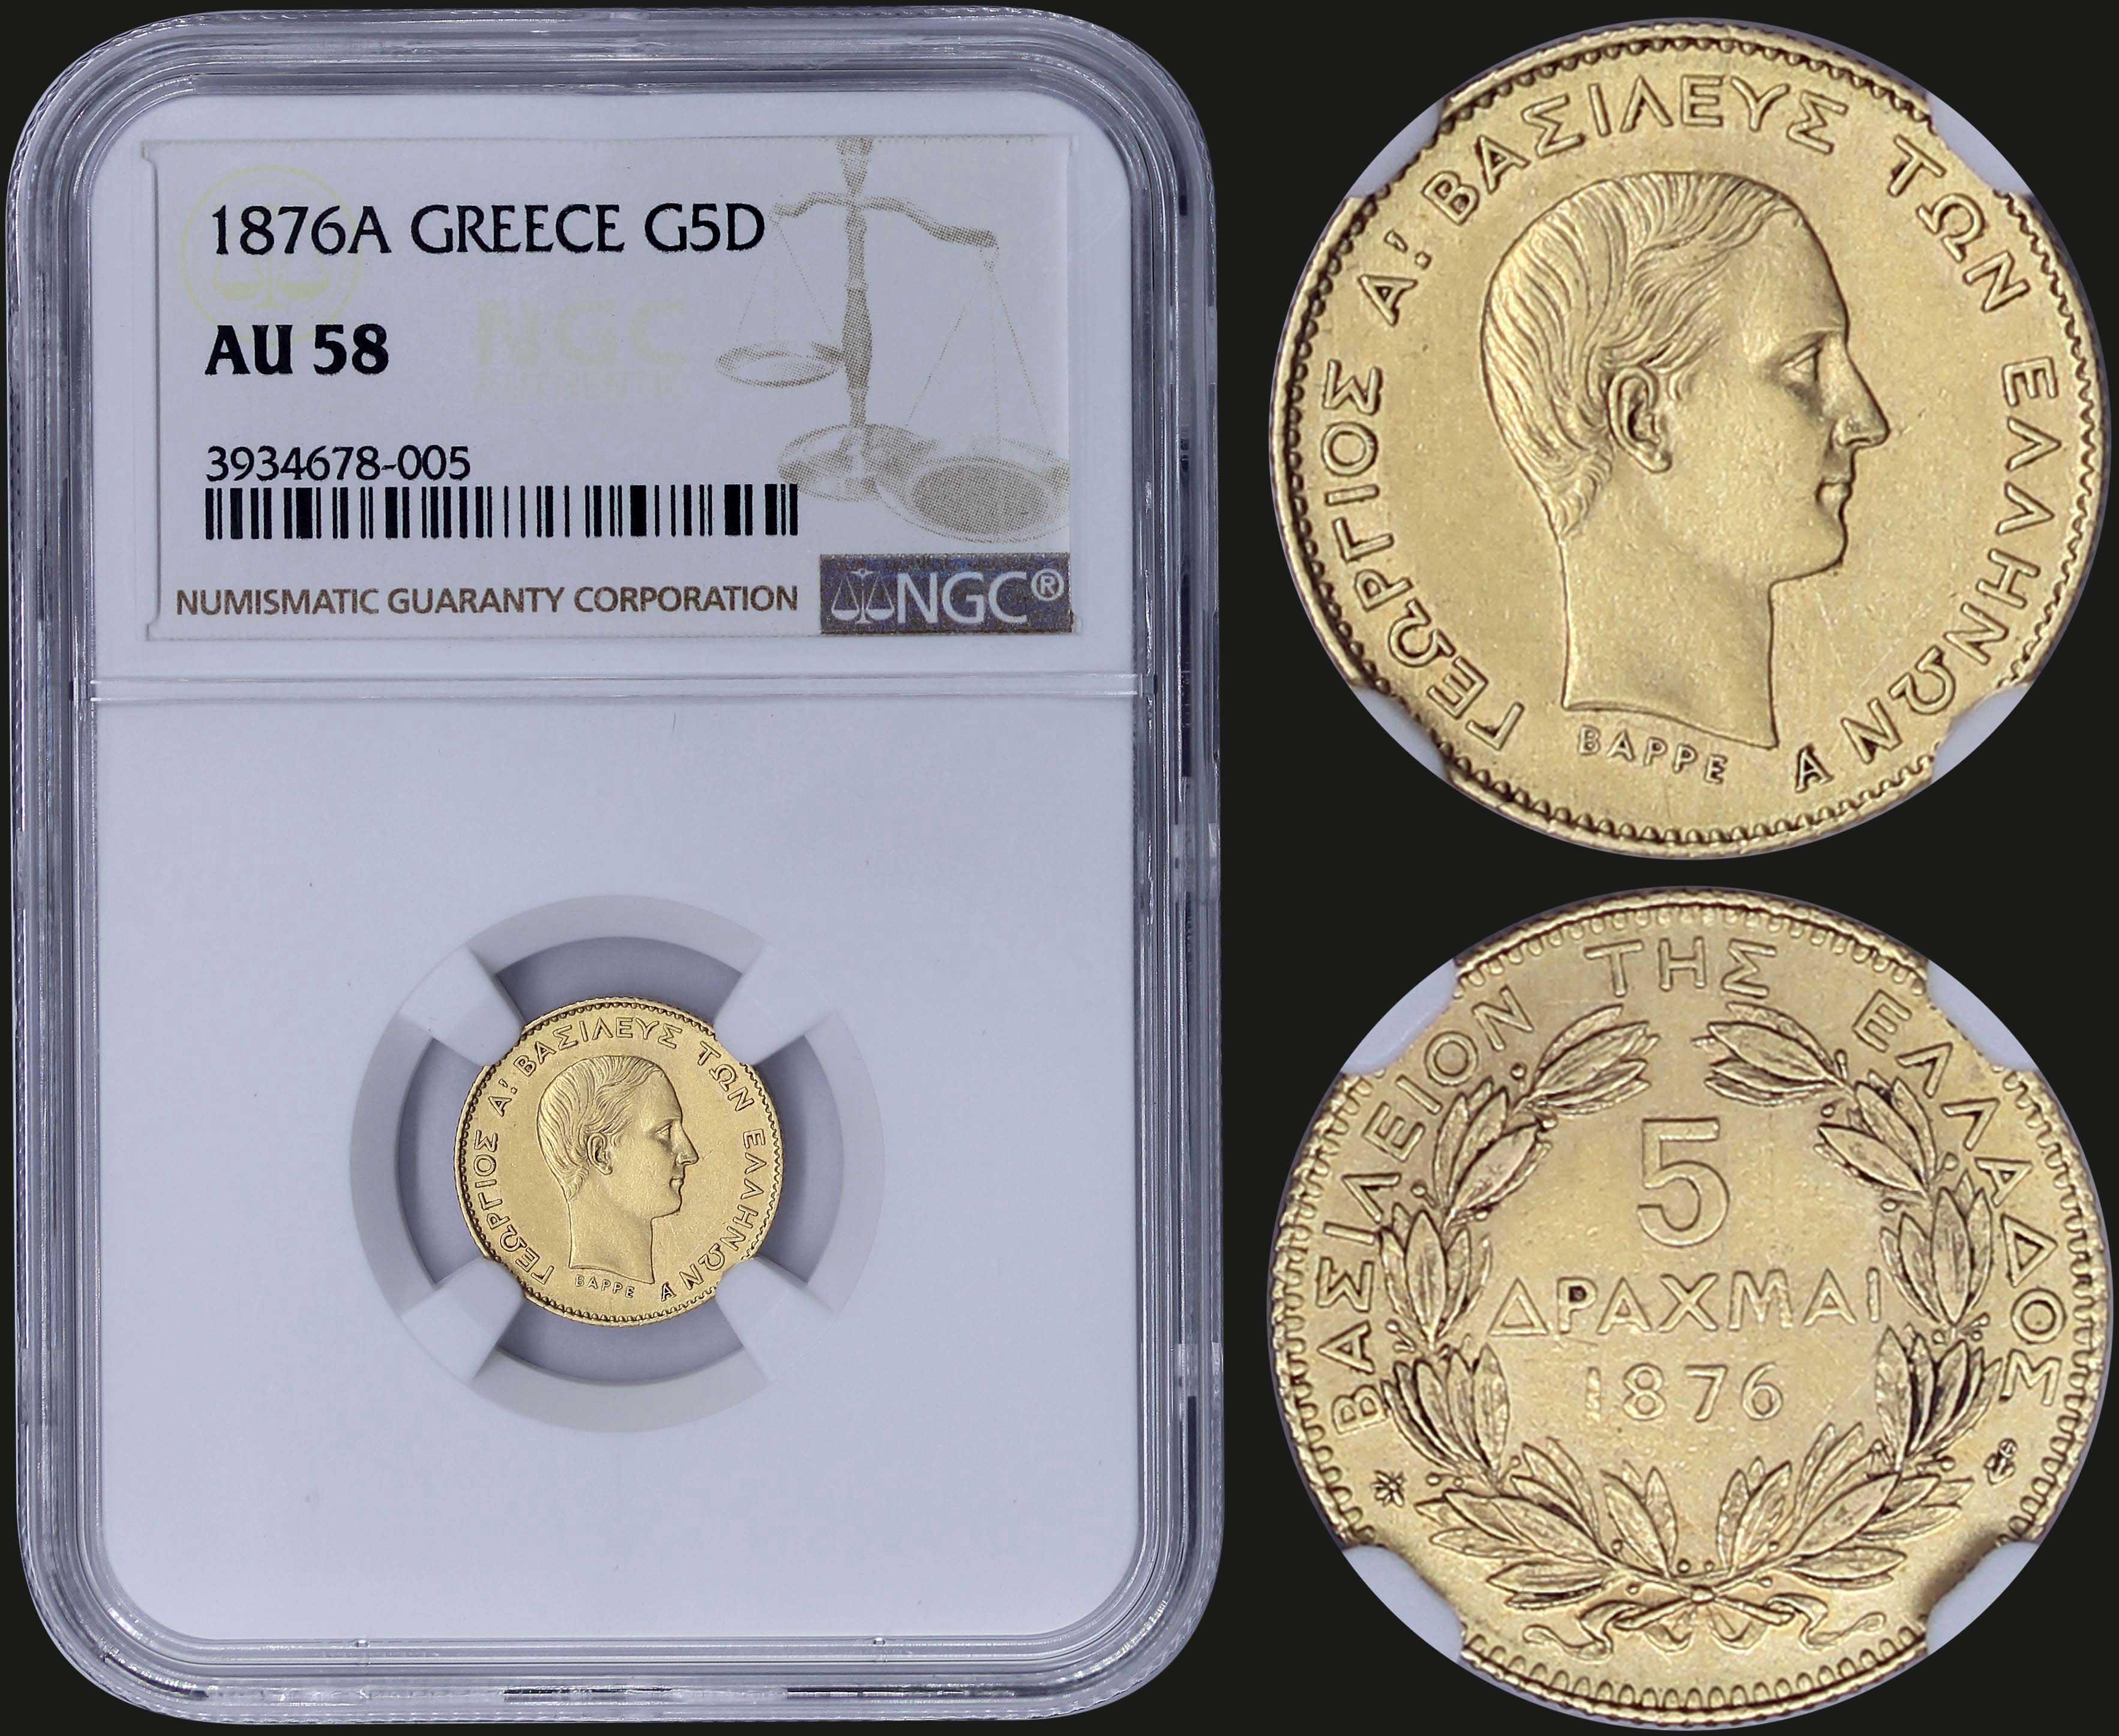 Lot 8132 - -  COINS & TOKENS king george i -  A. Karamitsos Public & Live Bid Auction 644 Coins, Medals & Banknotes